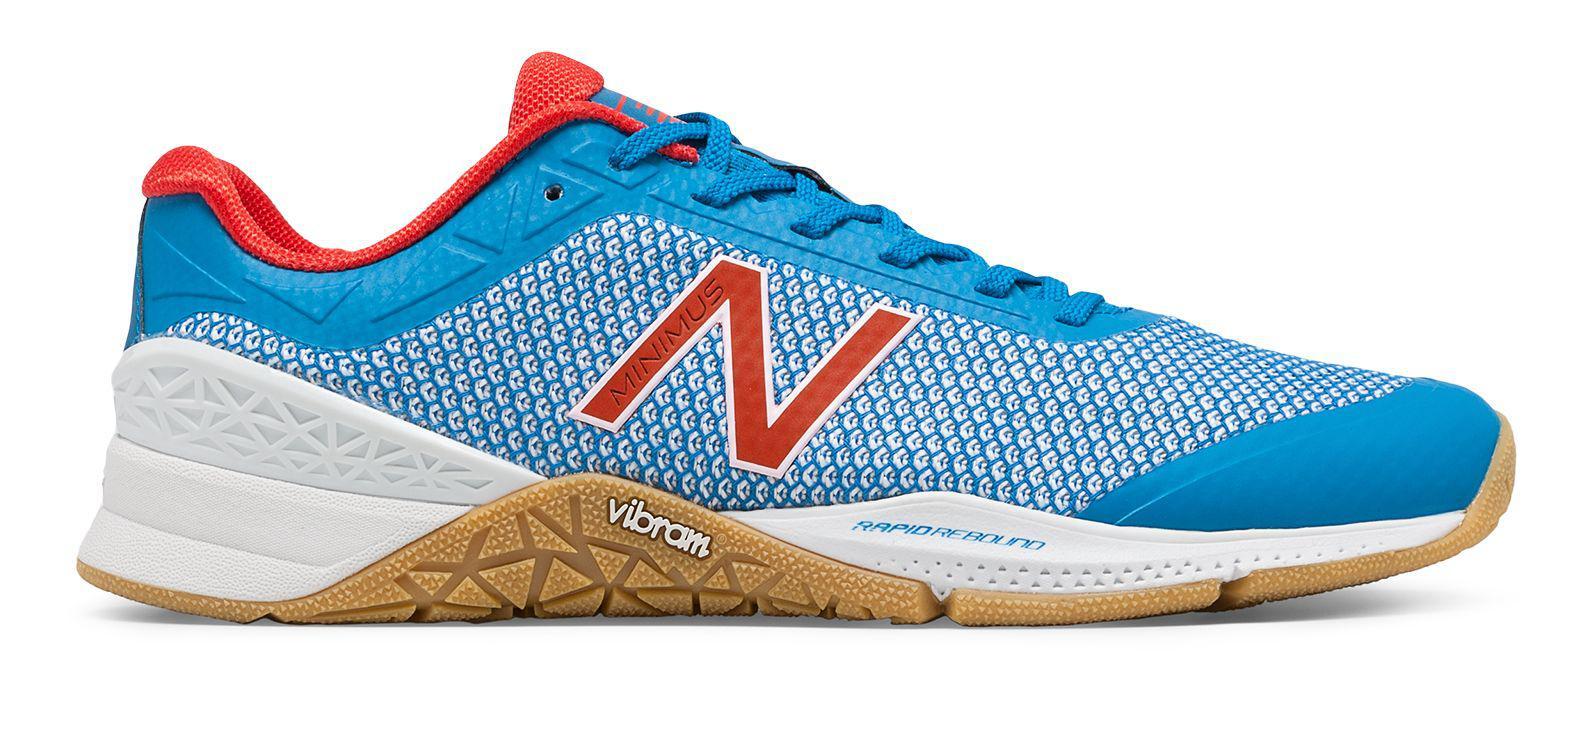 New Balance. Men's Blue Minimus 40 Trainer